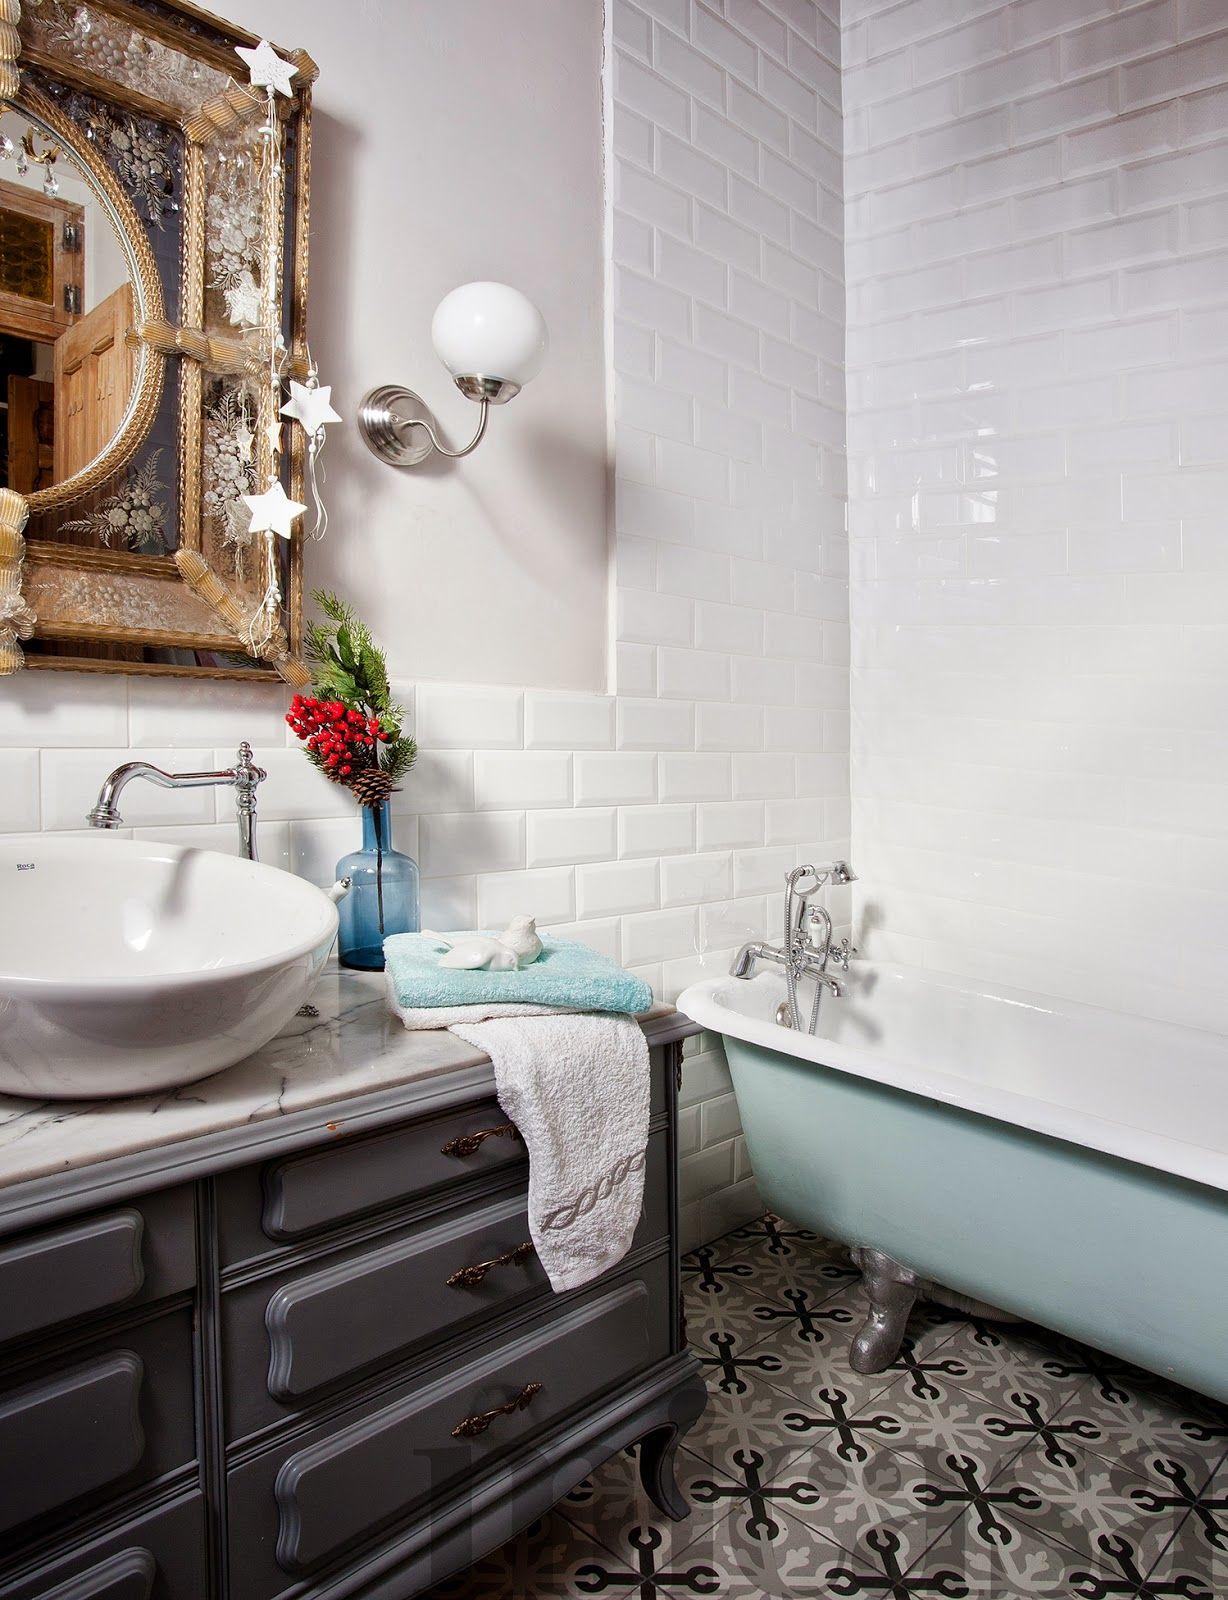 reformas dise o interiores arquitectura studiobmk ba o bath